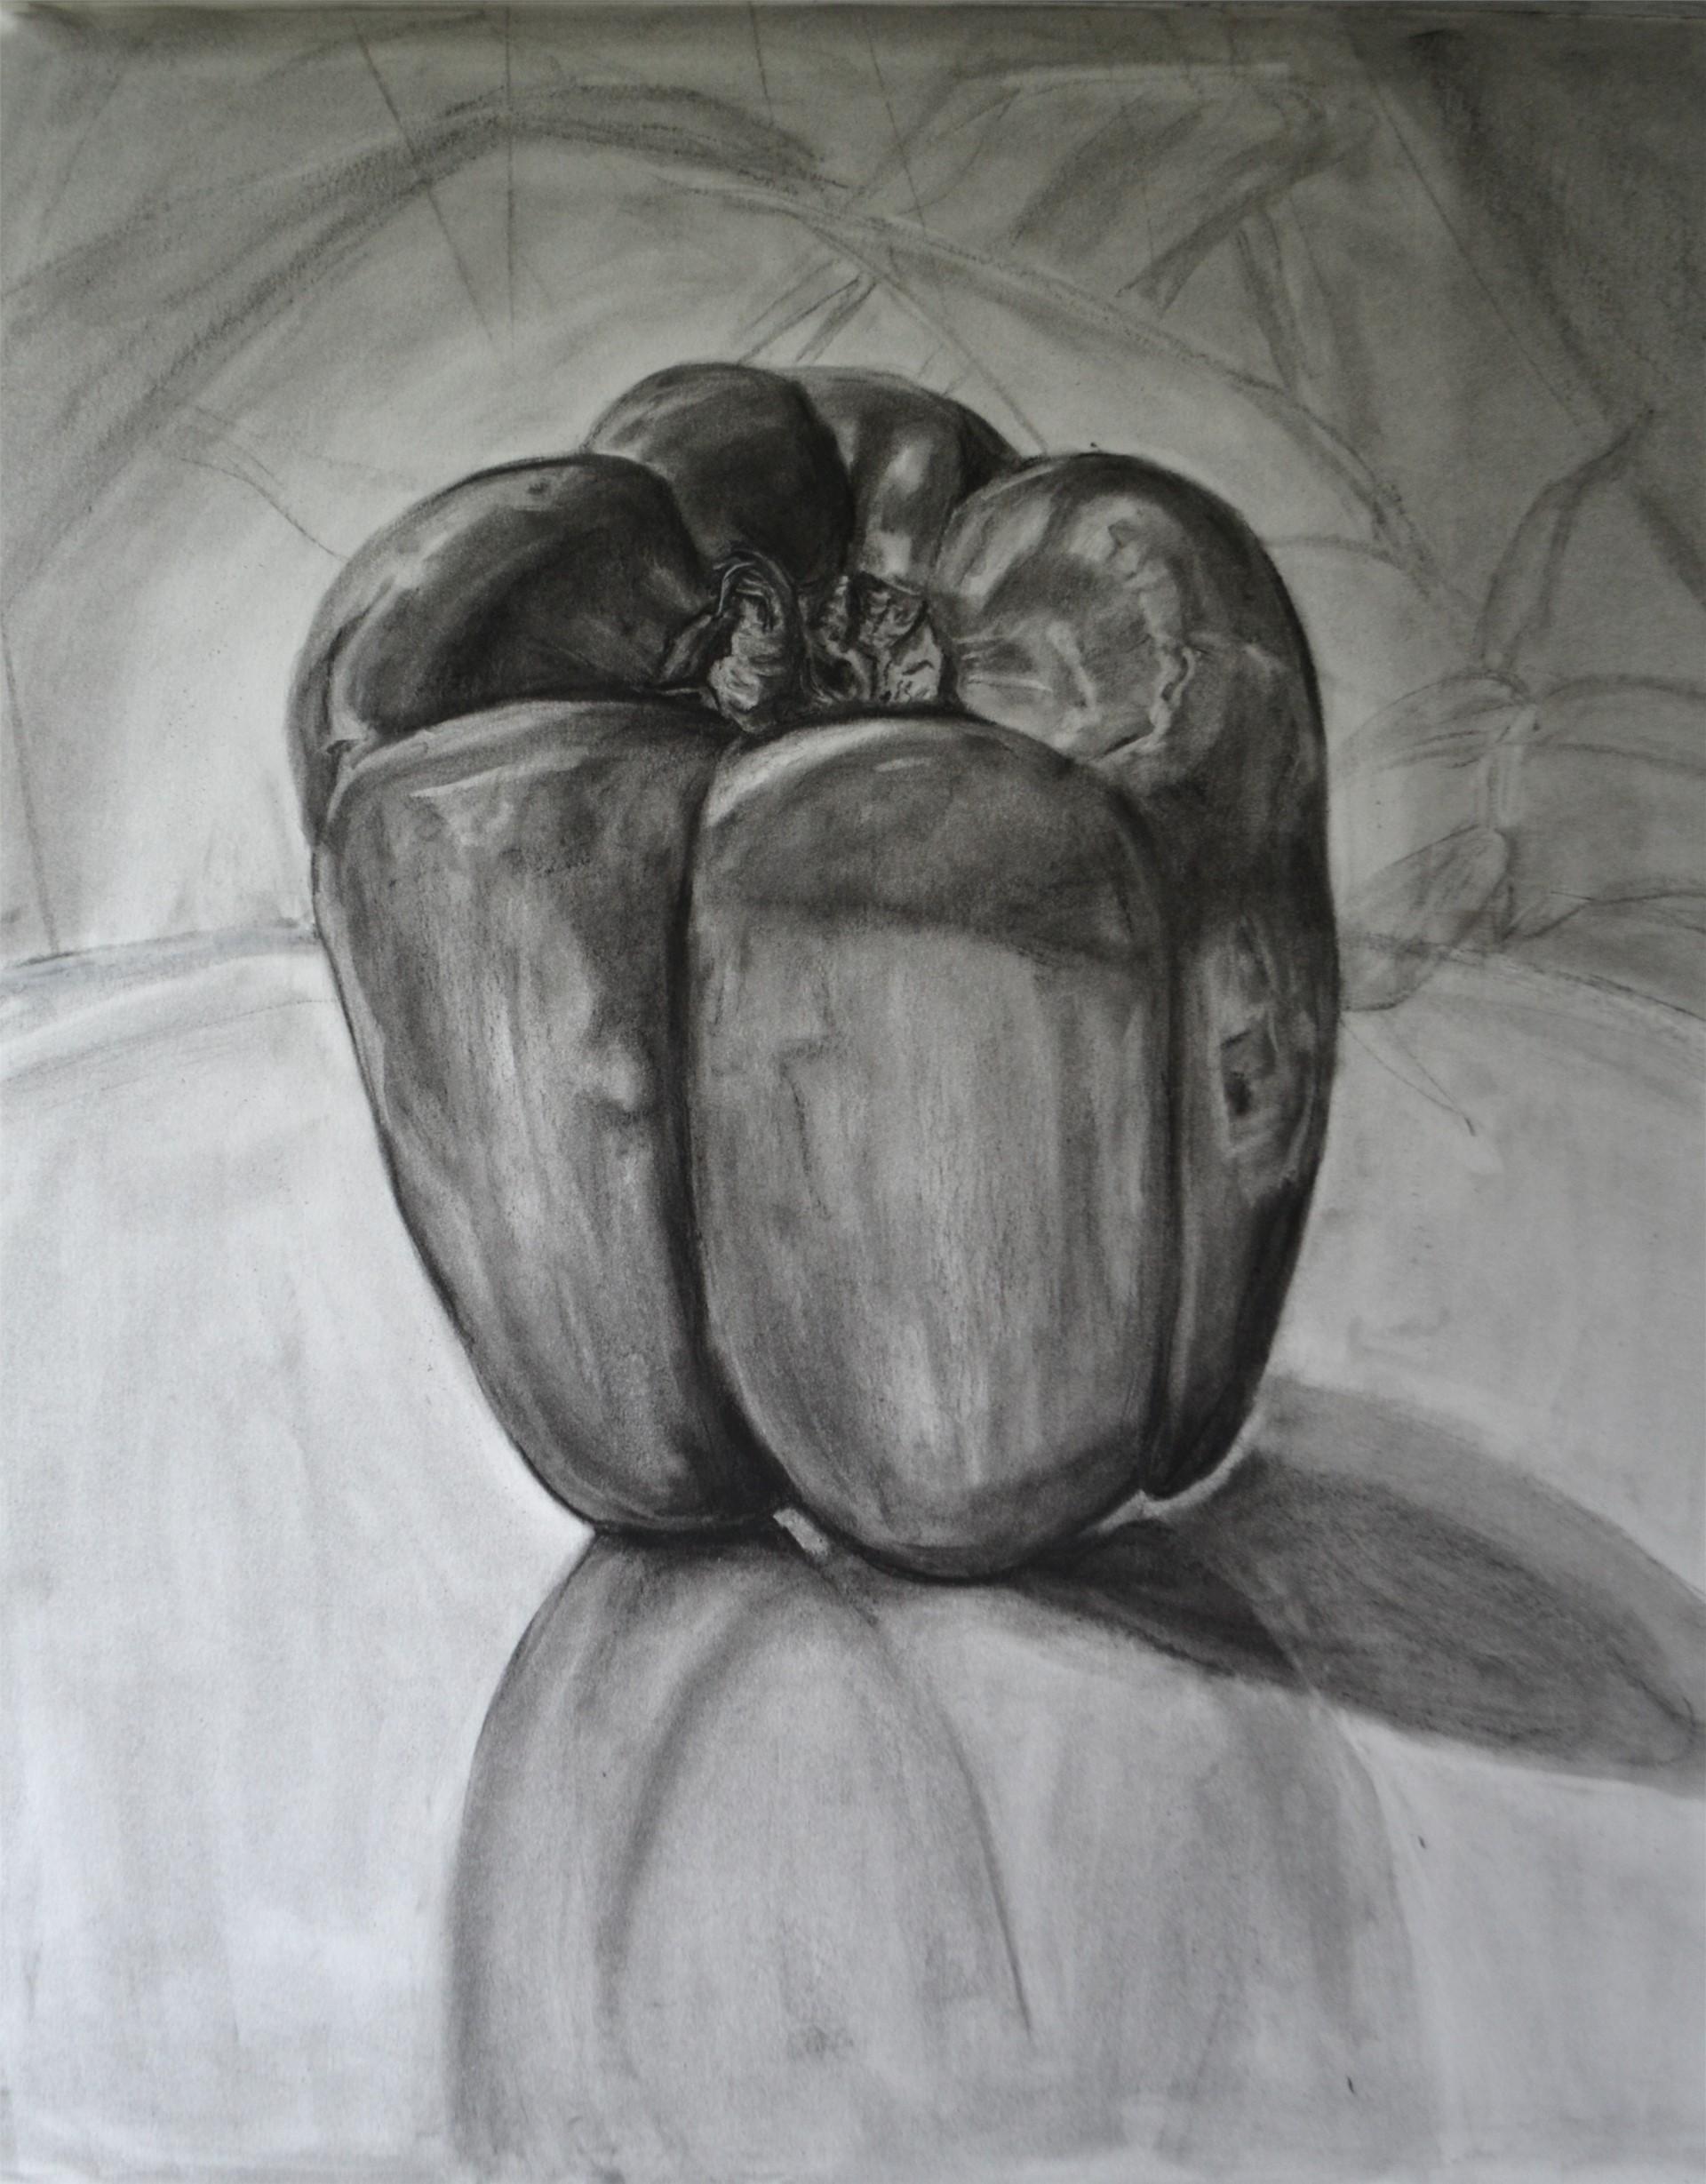 Amanda Rivers, Bell Pepper Study, charcoal on vellum bristol, 25 x 19, 2016